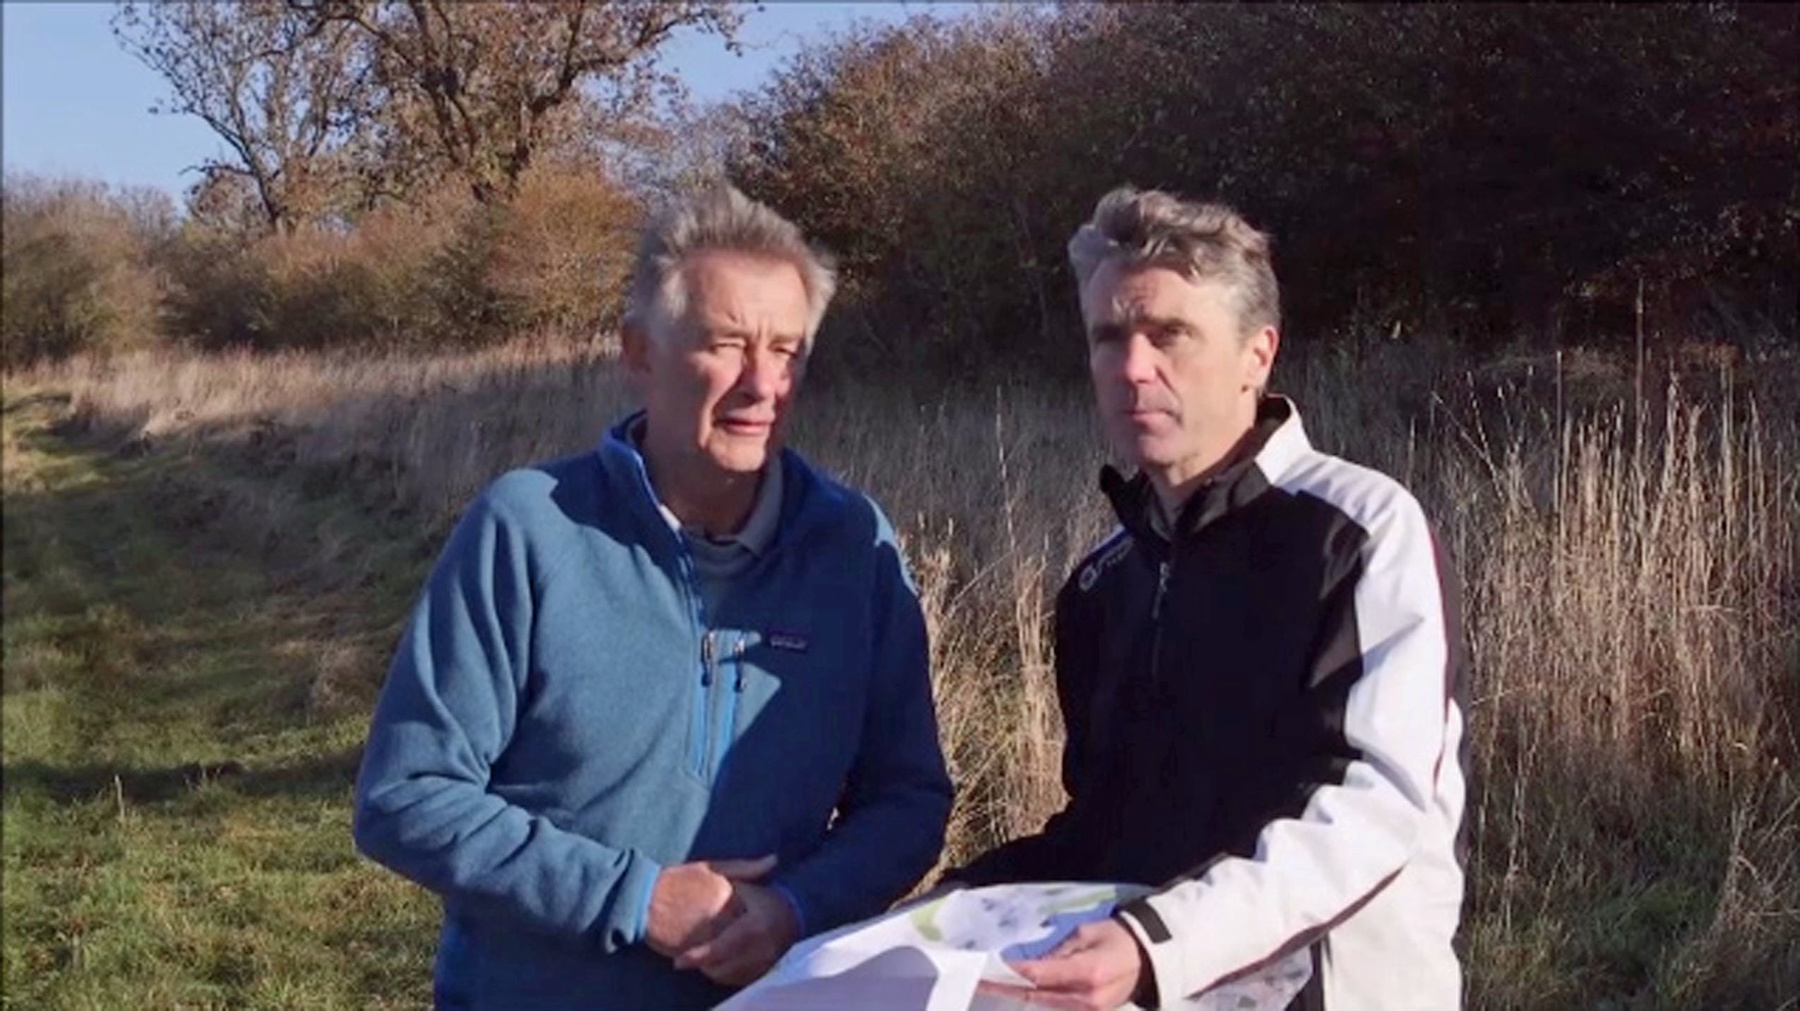 HOUGHTON Ken Brown & Ken Moode on site 3